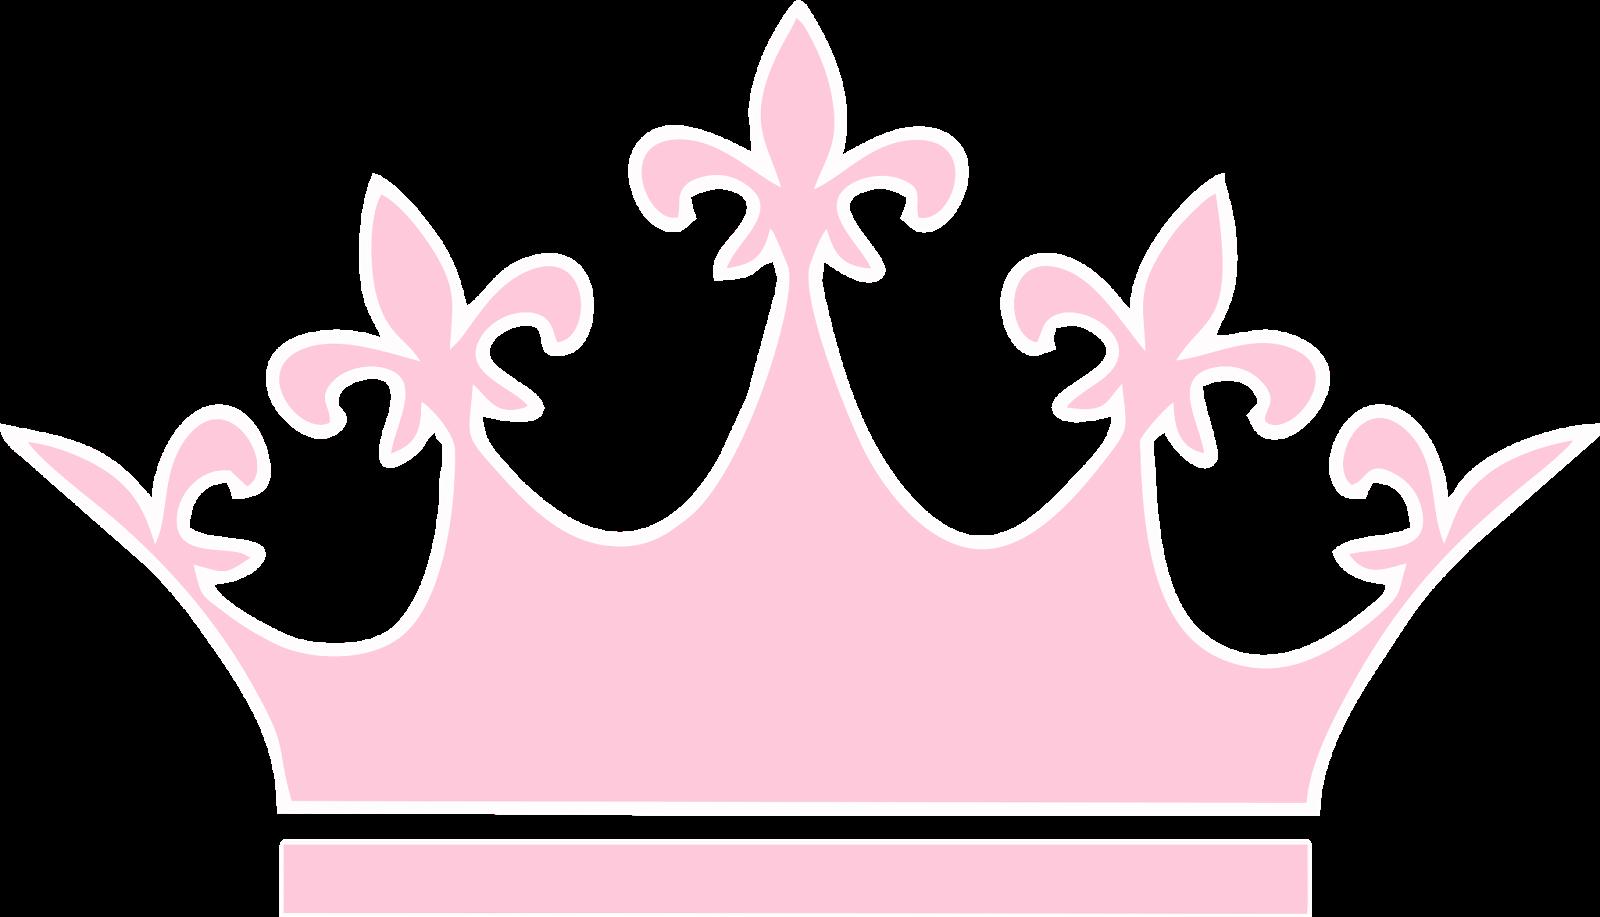 Crown royalstripes clipart clip art free download Coroa imagem para montagens digitais | Layouts, Template and Scrapbook clip art free download